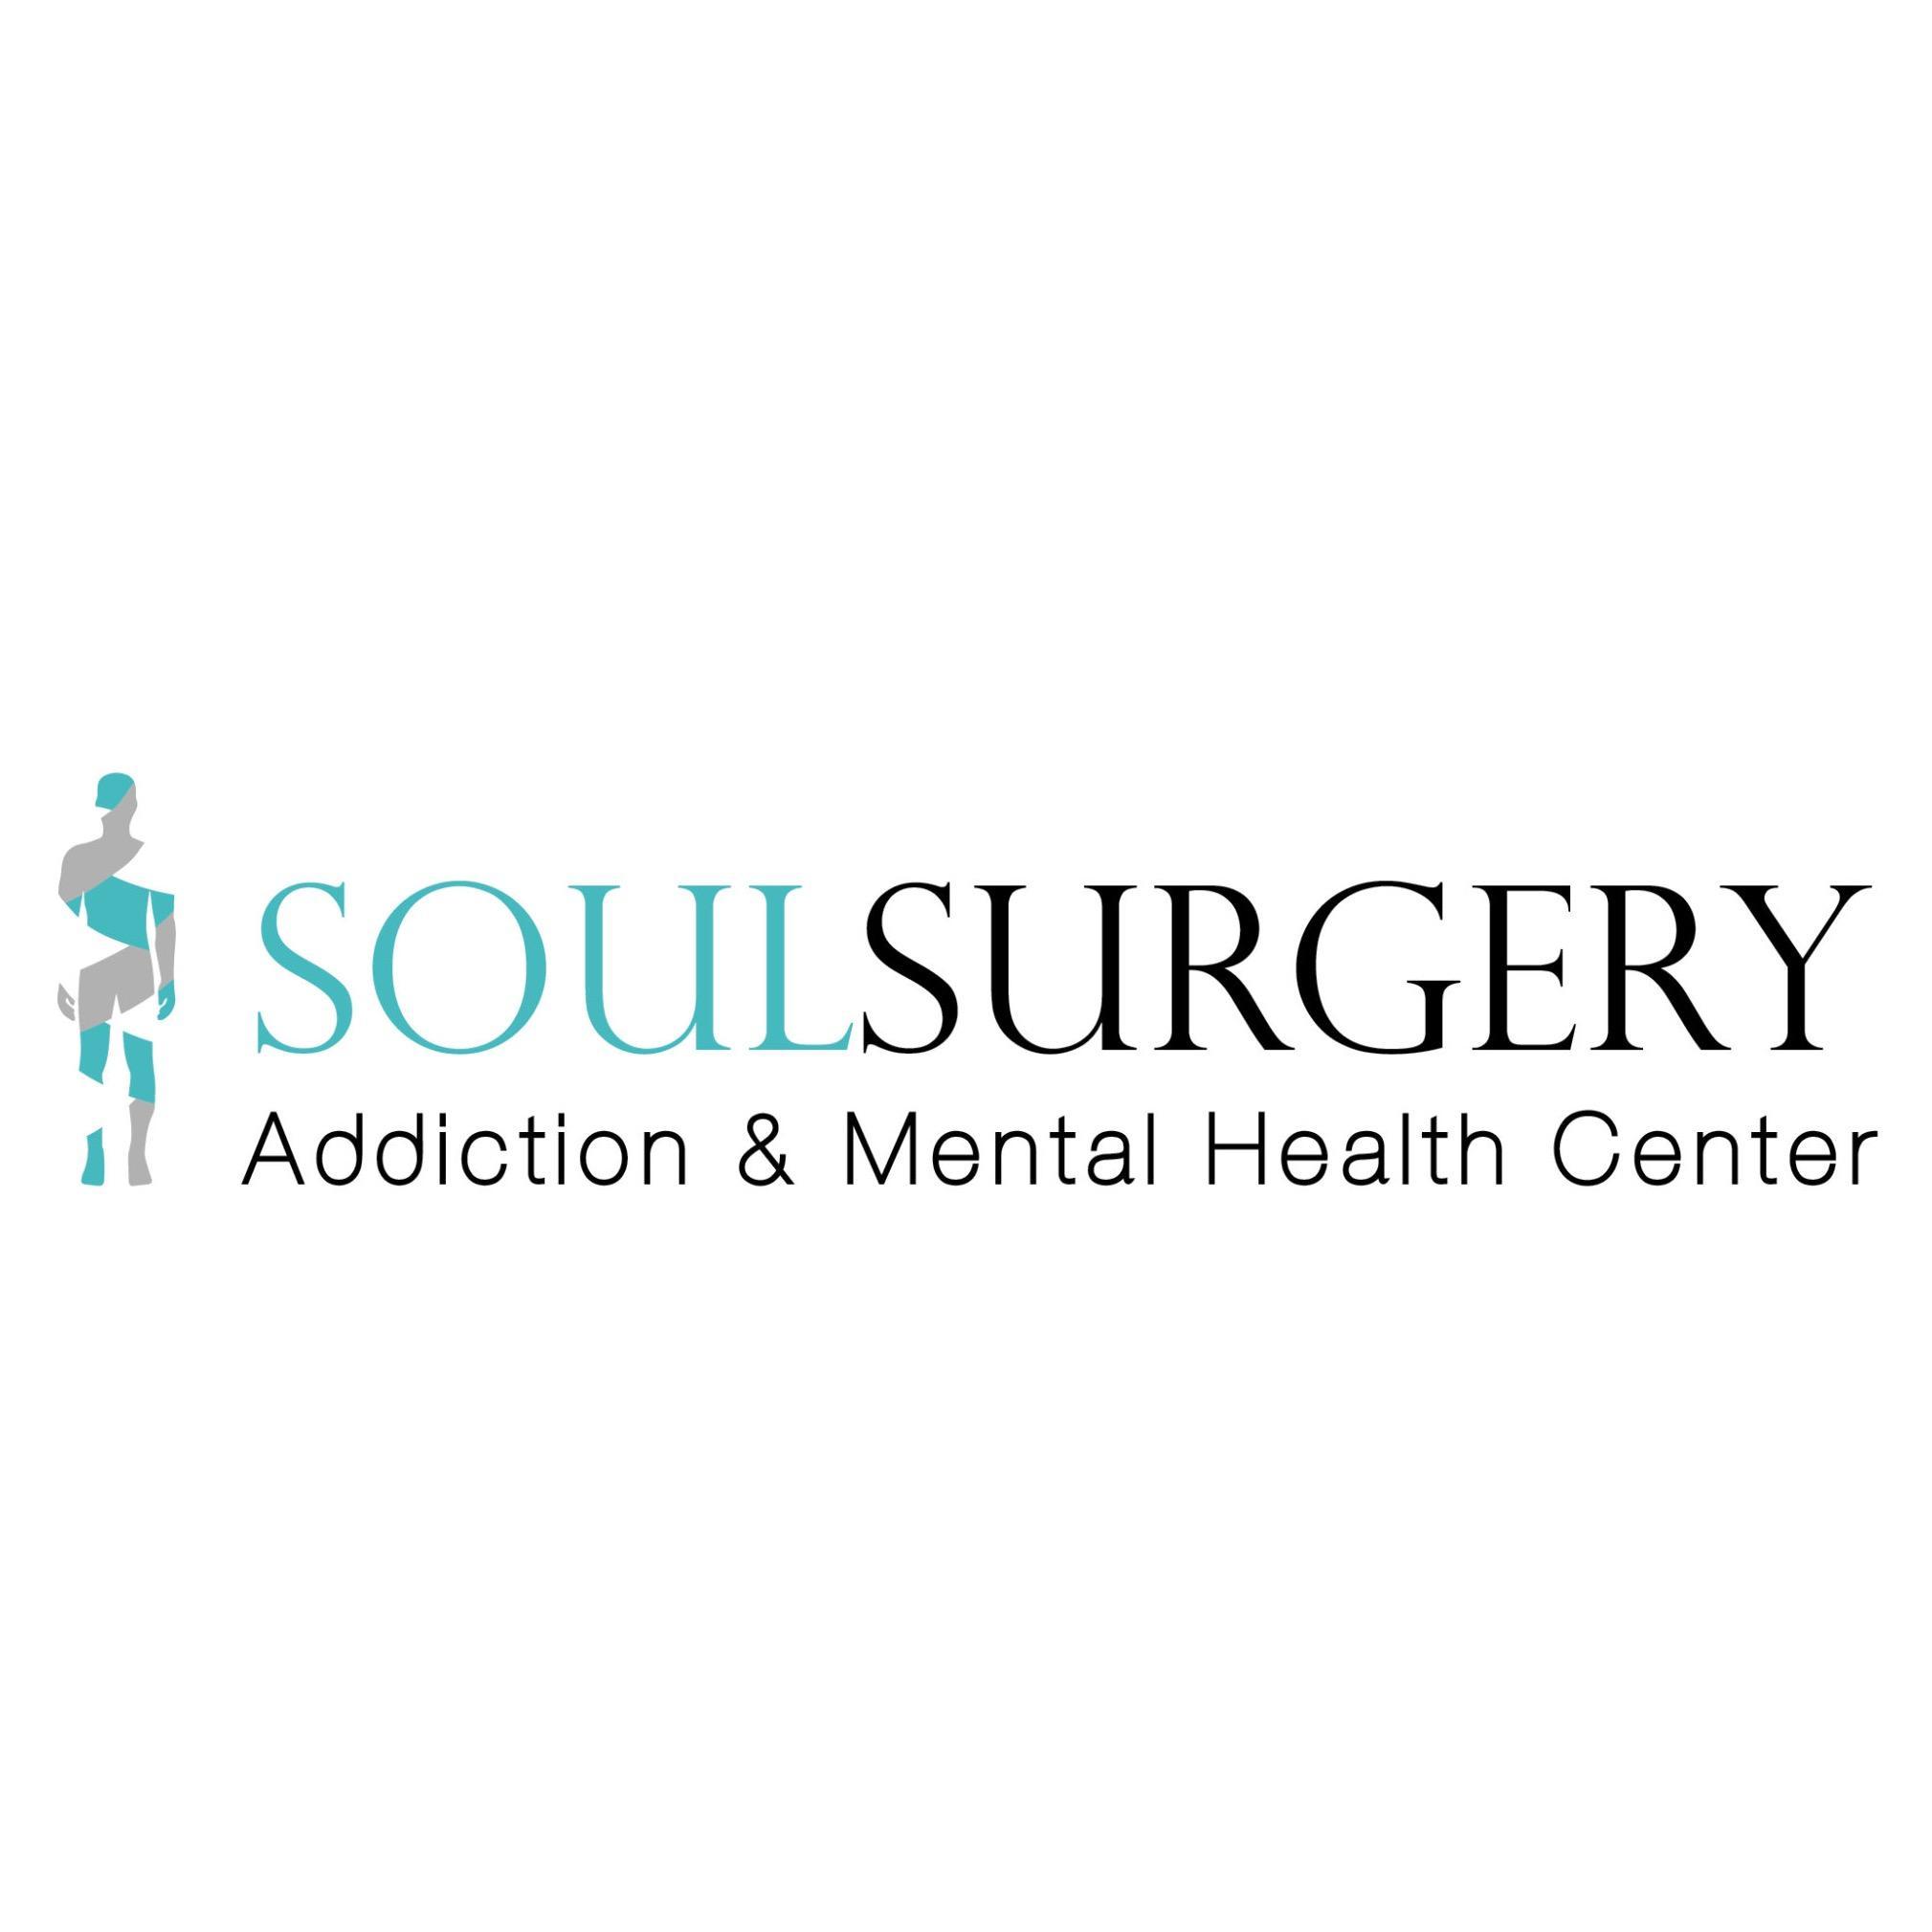 Soul Surgery Drug Rehab & Detox Center